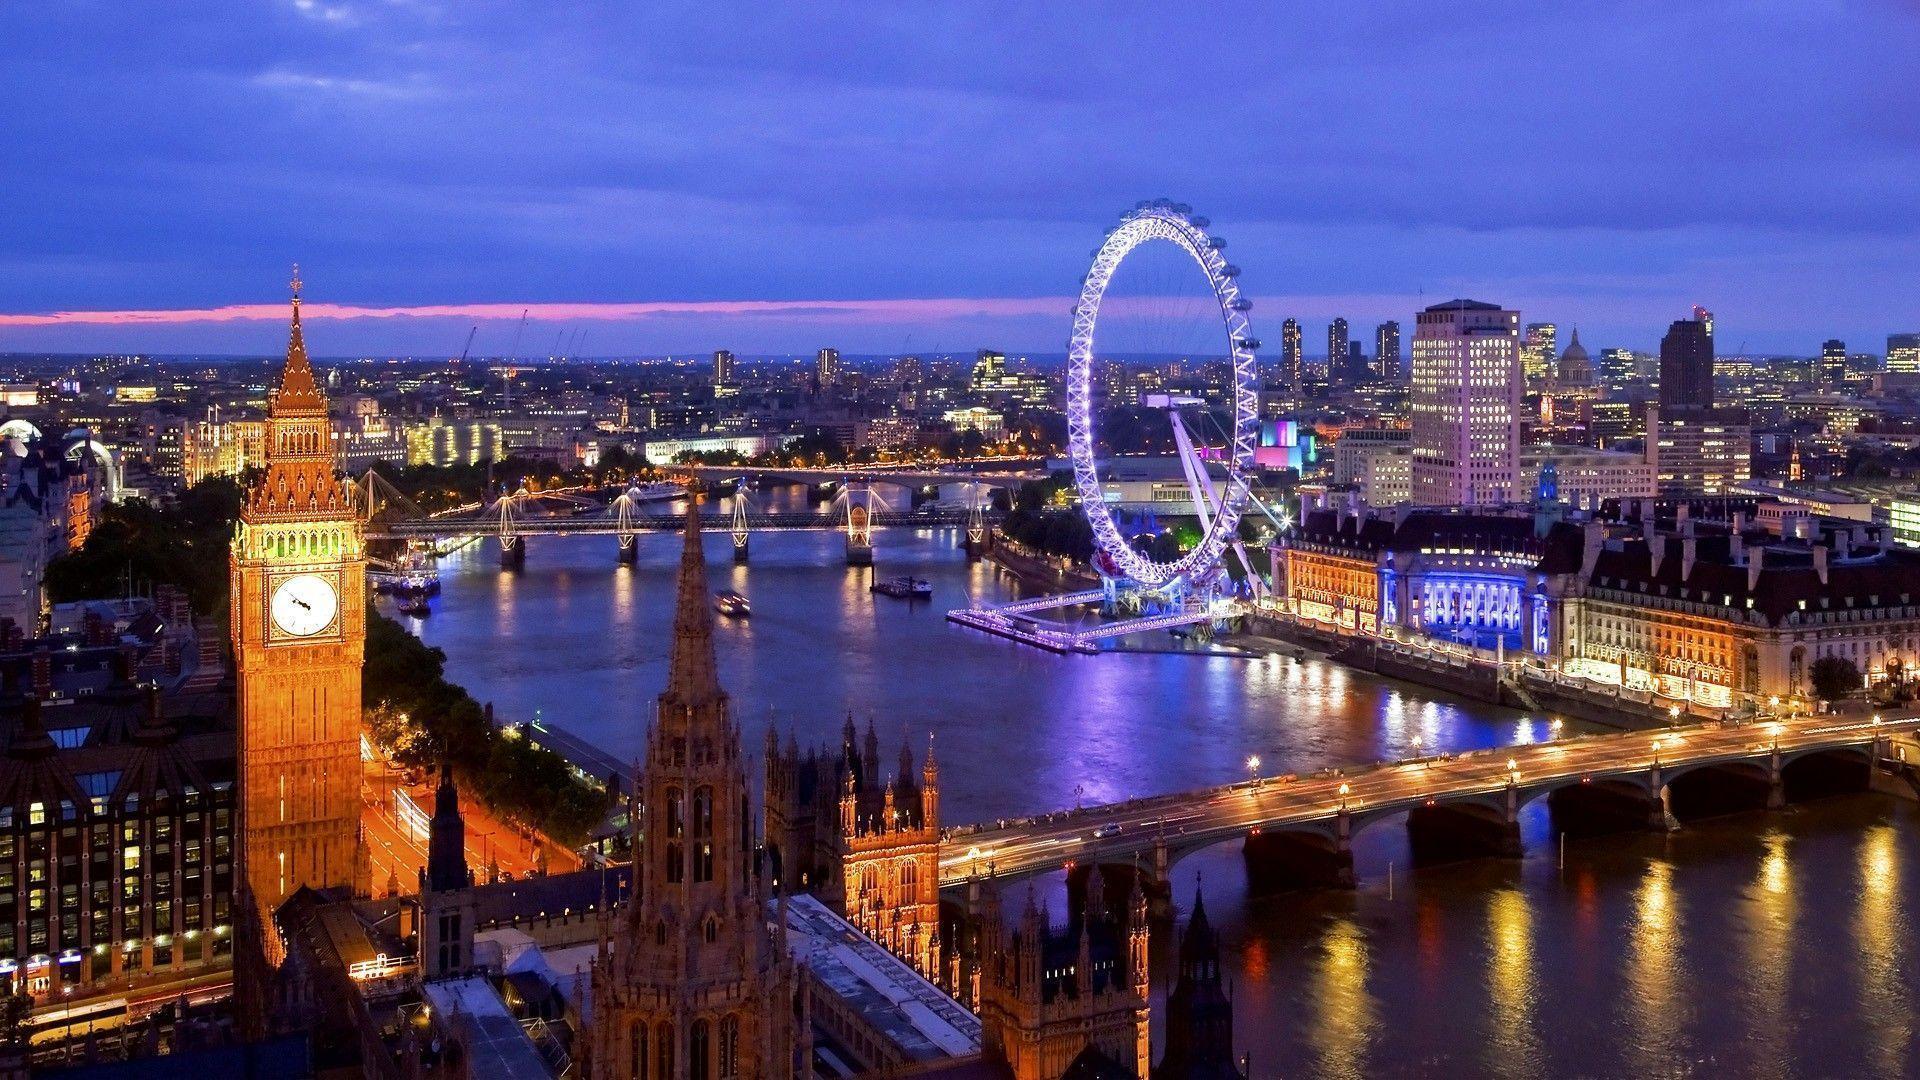 London Desktop Wallpapers   Top London Desktop Backgrounds 1920x1080